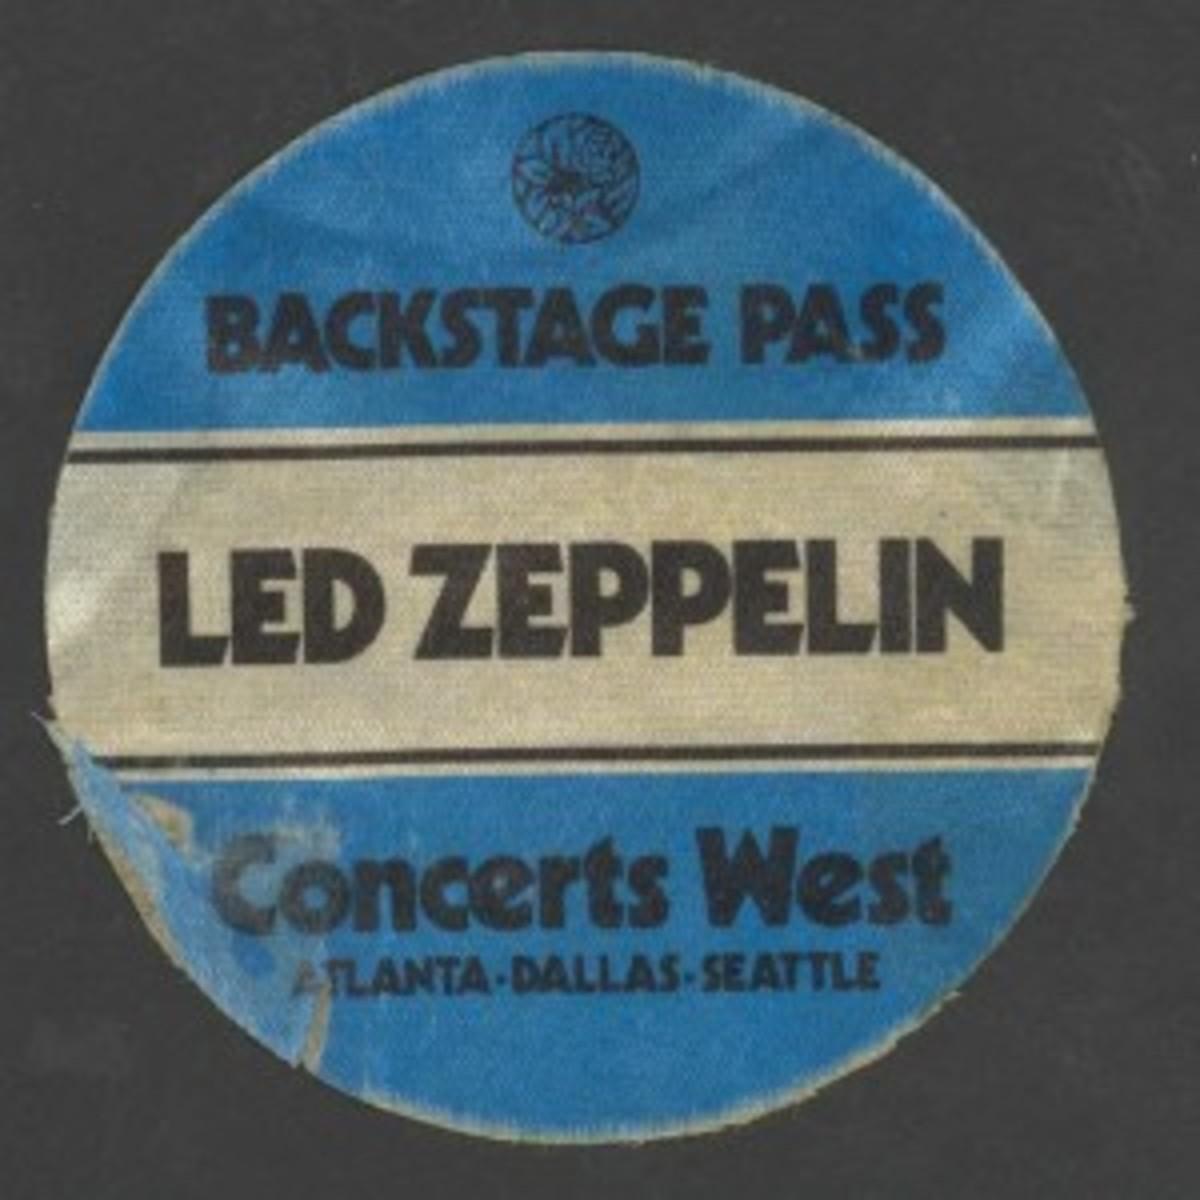 led zepp 1979 ribbon pass